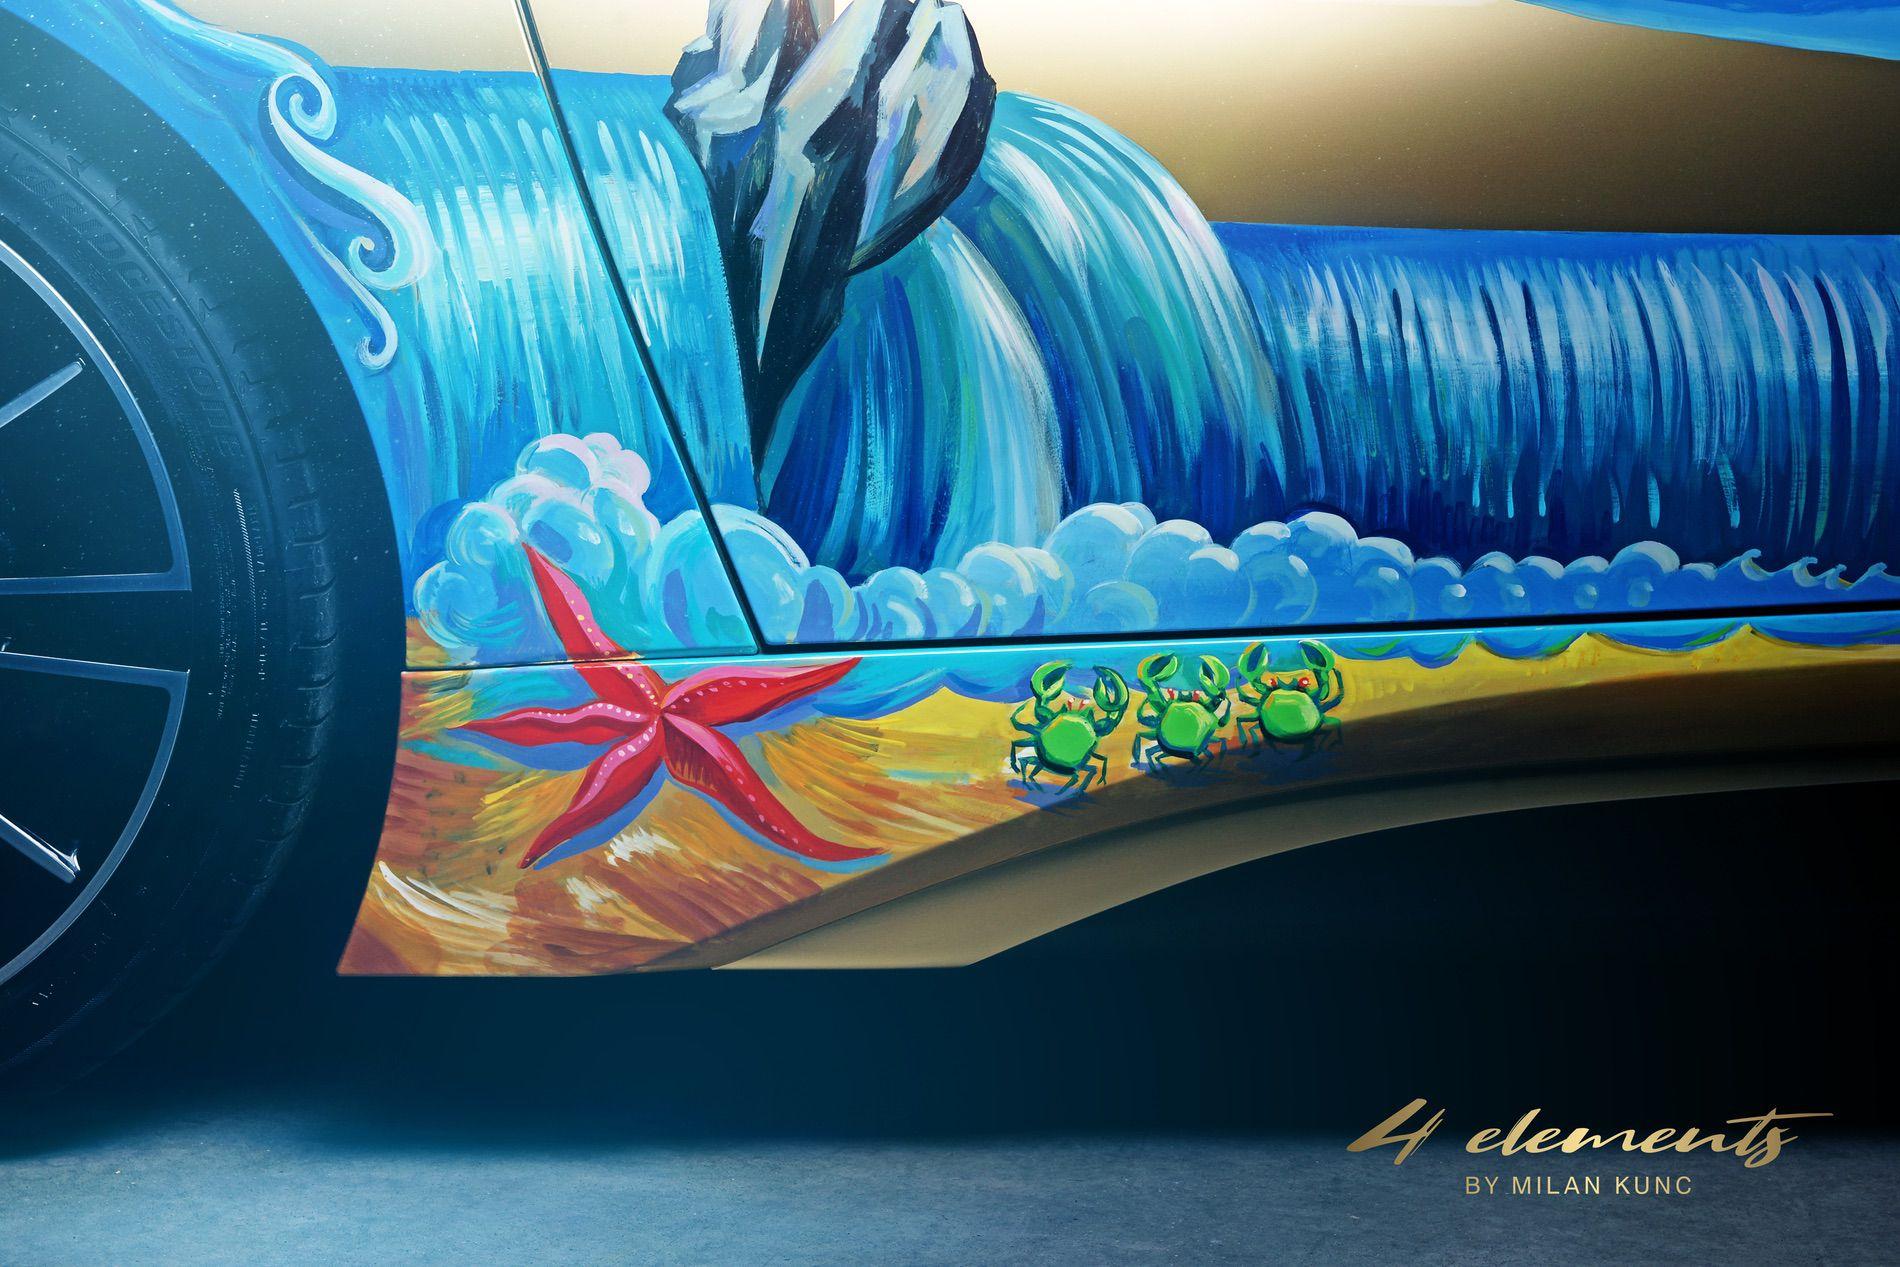 BMW i8 Roadster 4 Elements Art Car by Milan Kunc (7)